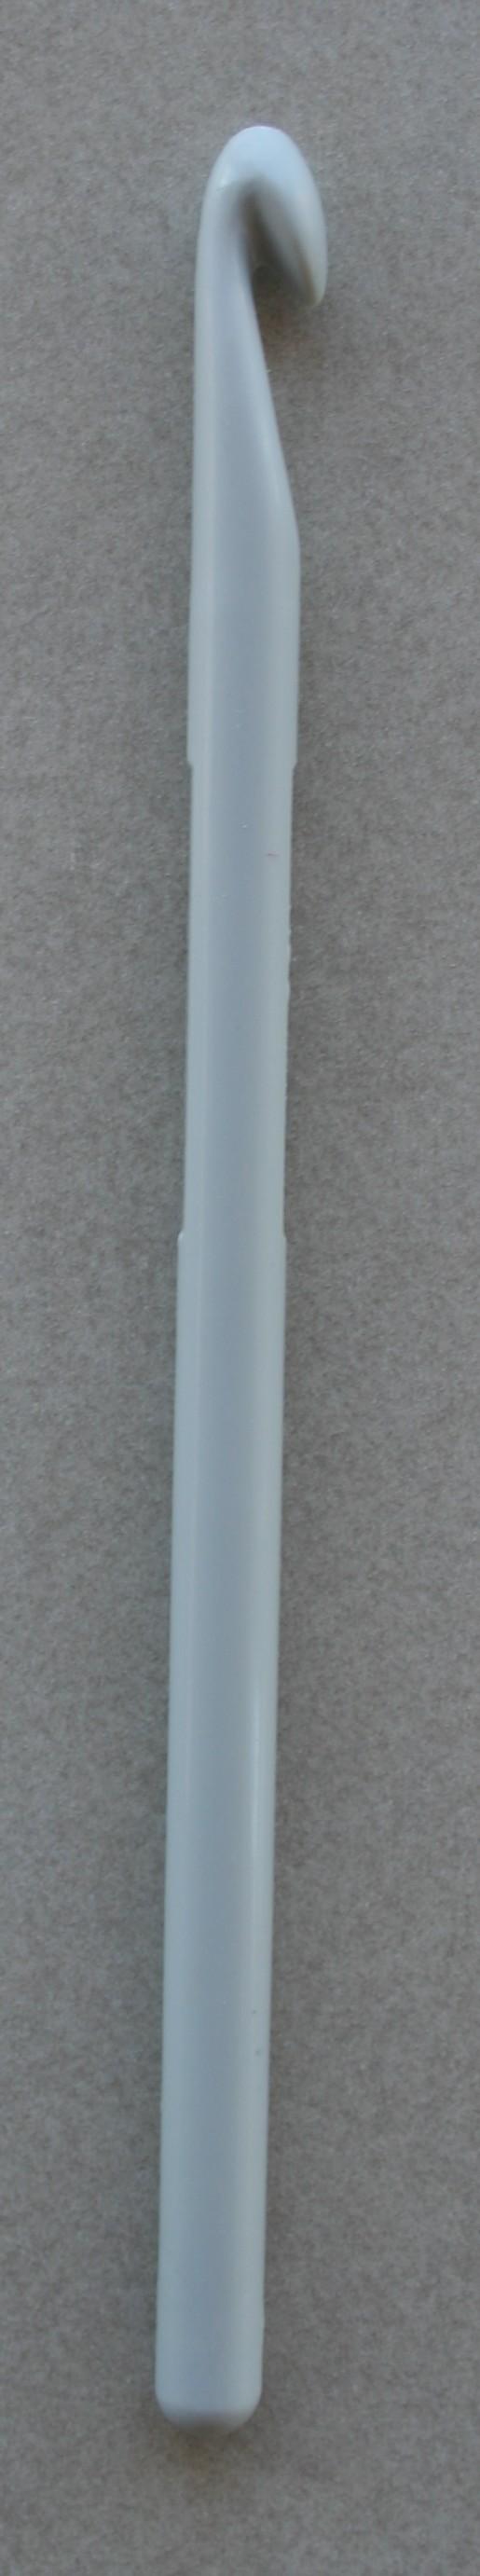 06 mm - 15 cm